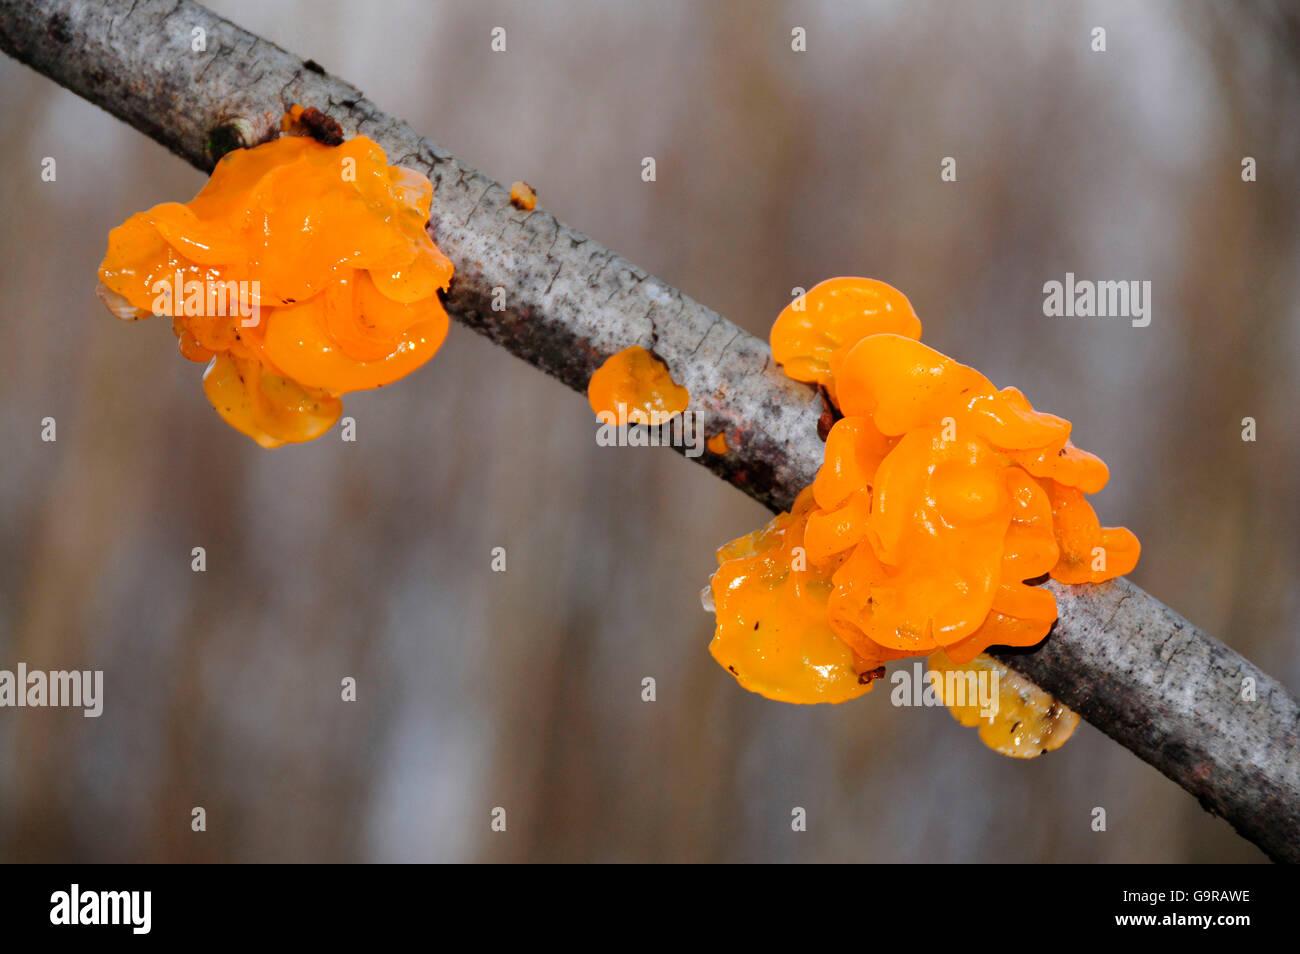 Golden Jelly Fungus / Tremella mesenterica - Stock Image